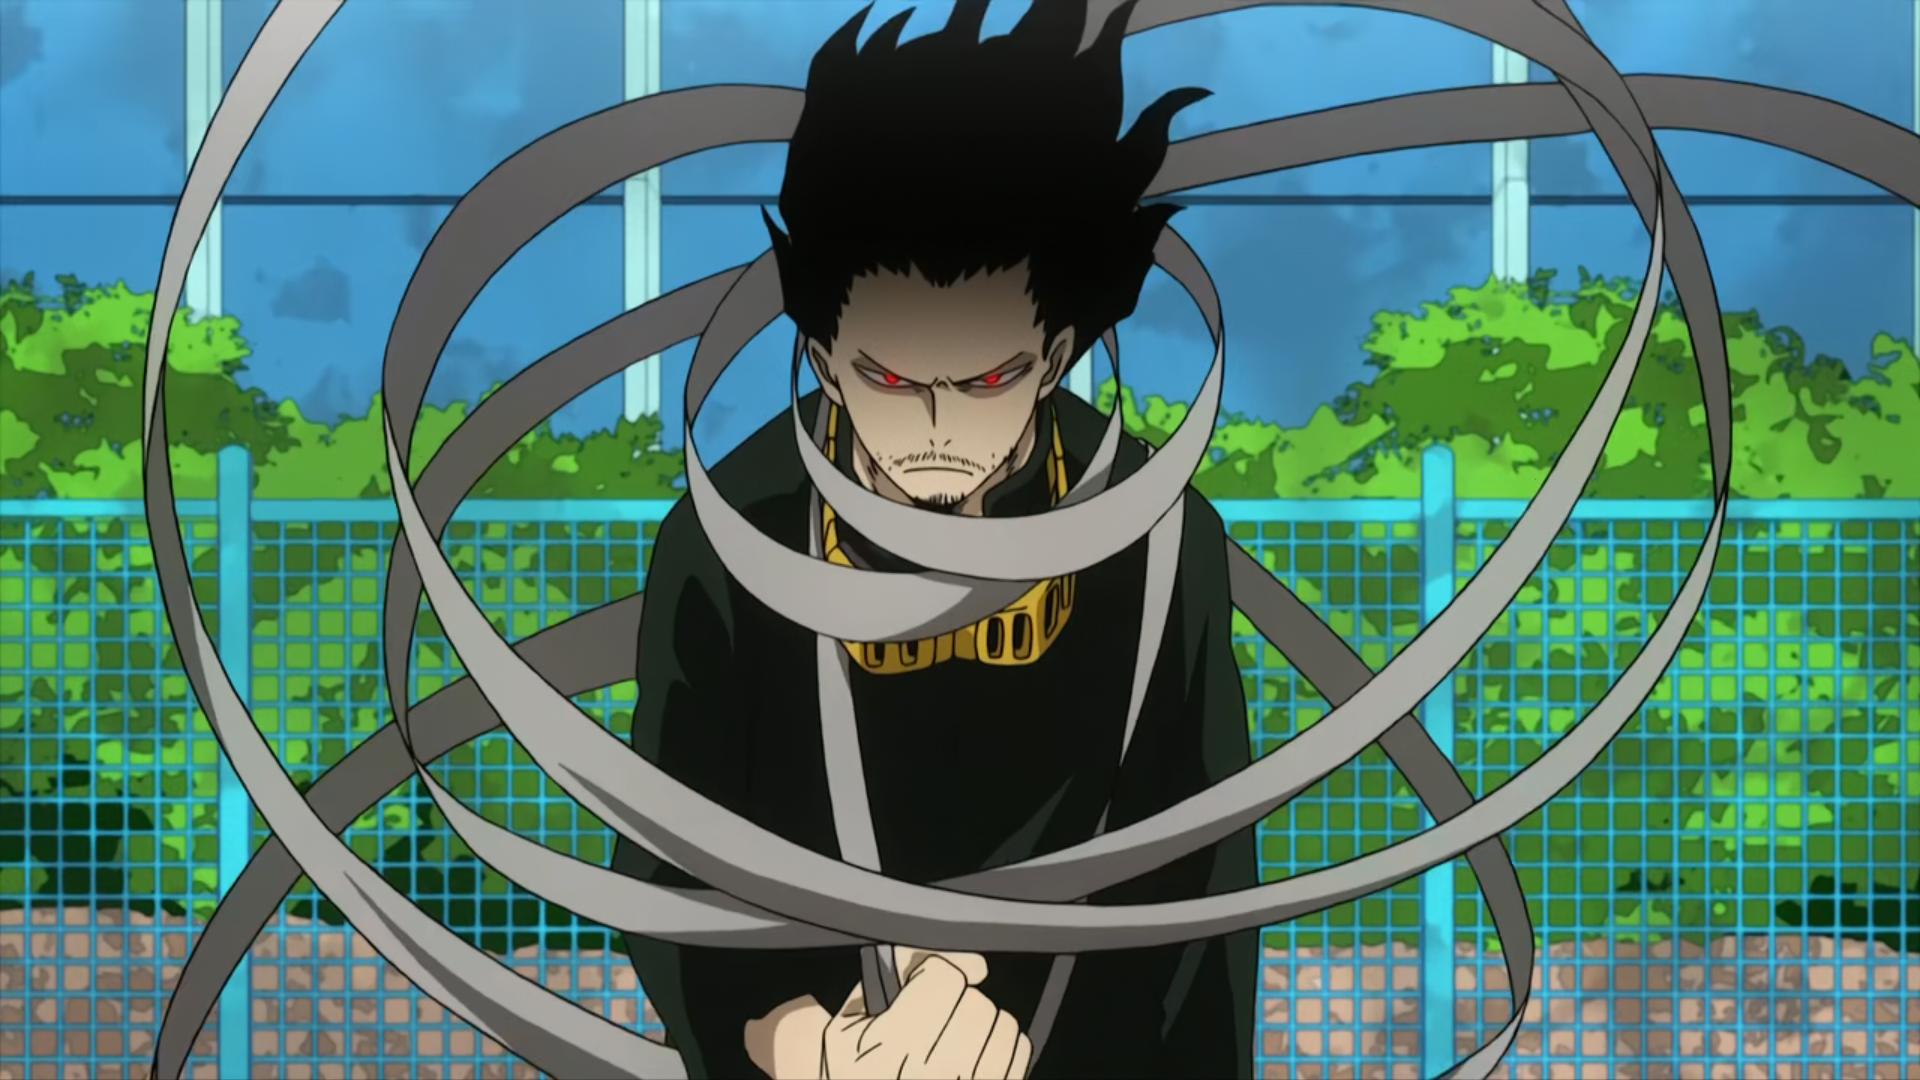 Boku no Eraser Head Aizawa Shouta My Hero Academia Goggles and Belt -